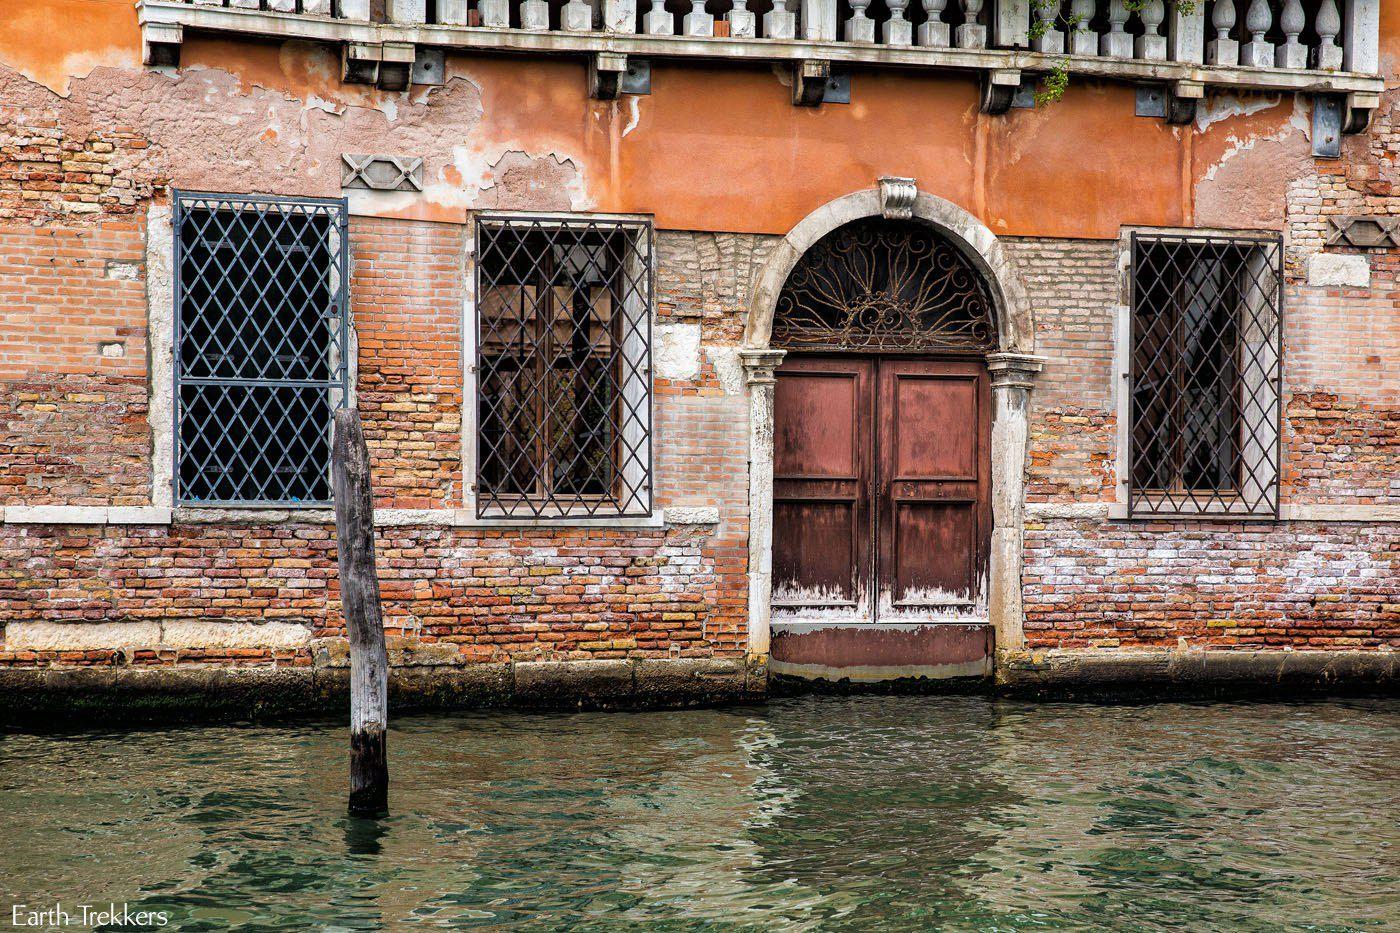 Venice is Sinking